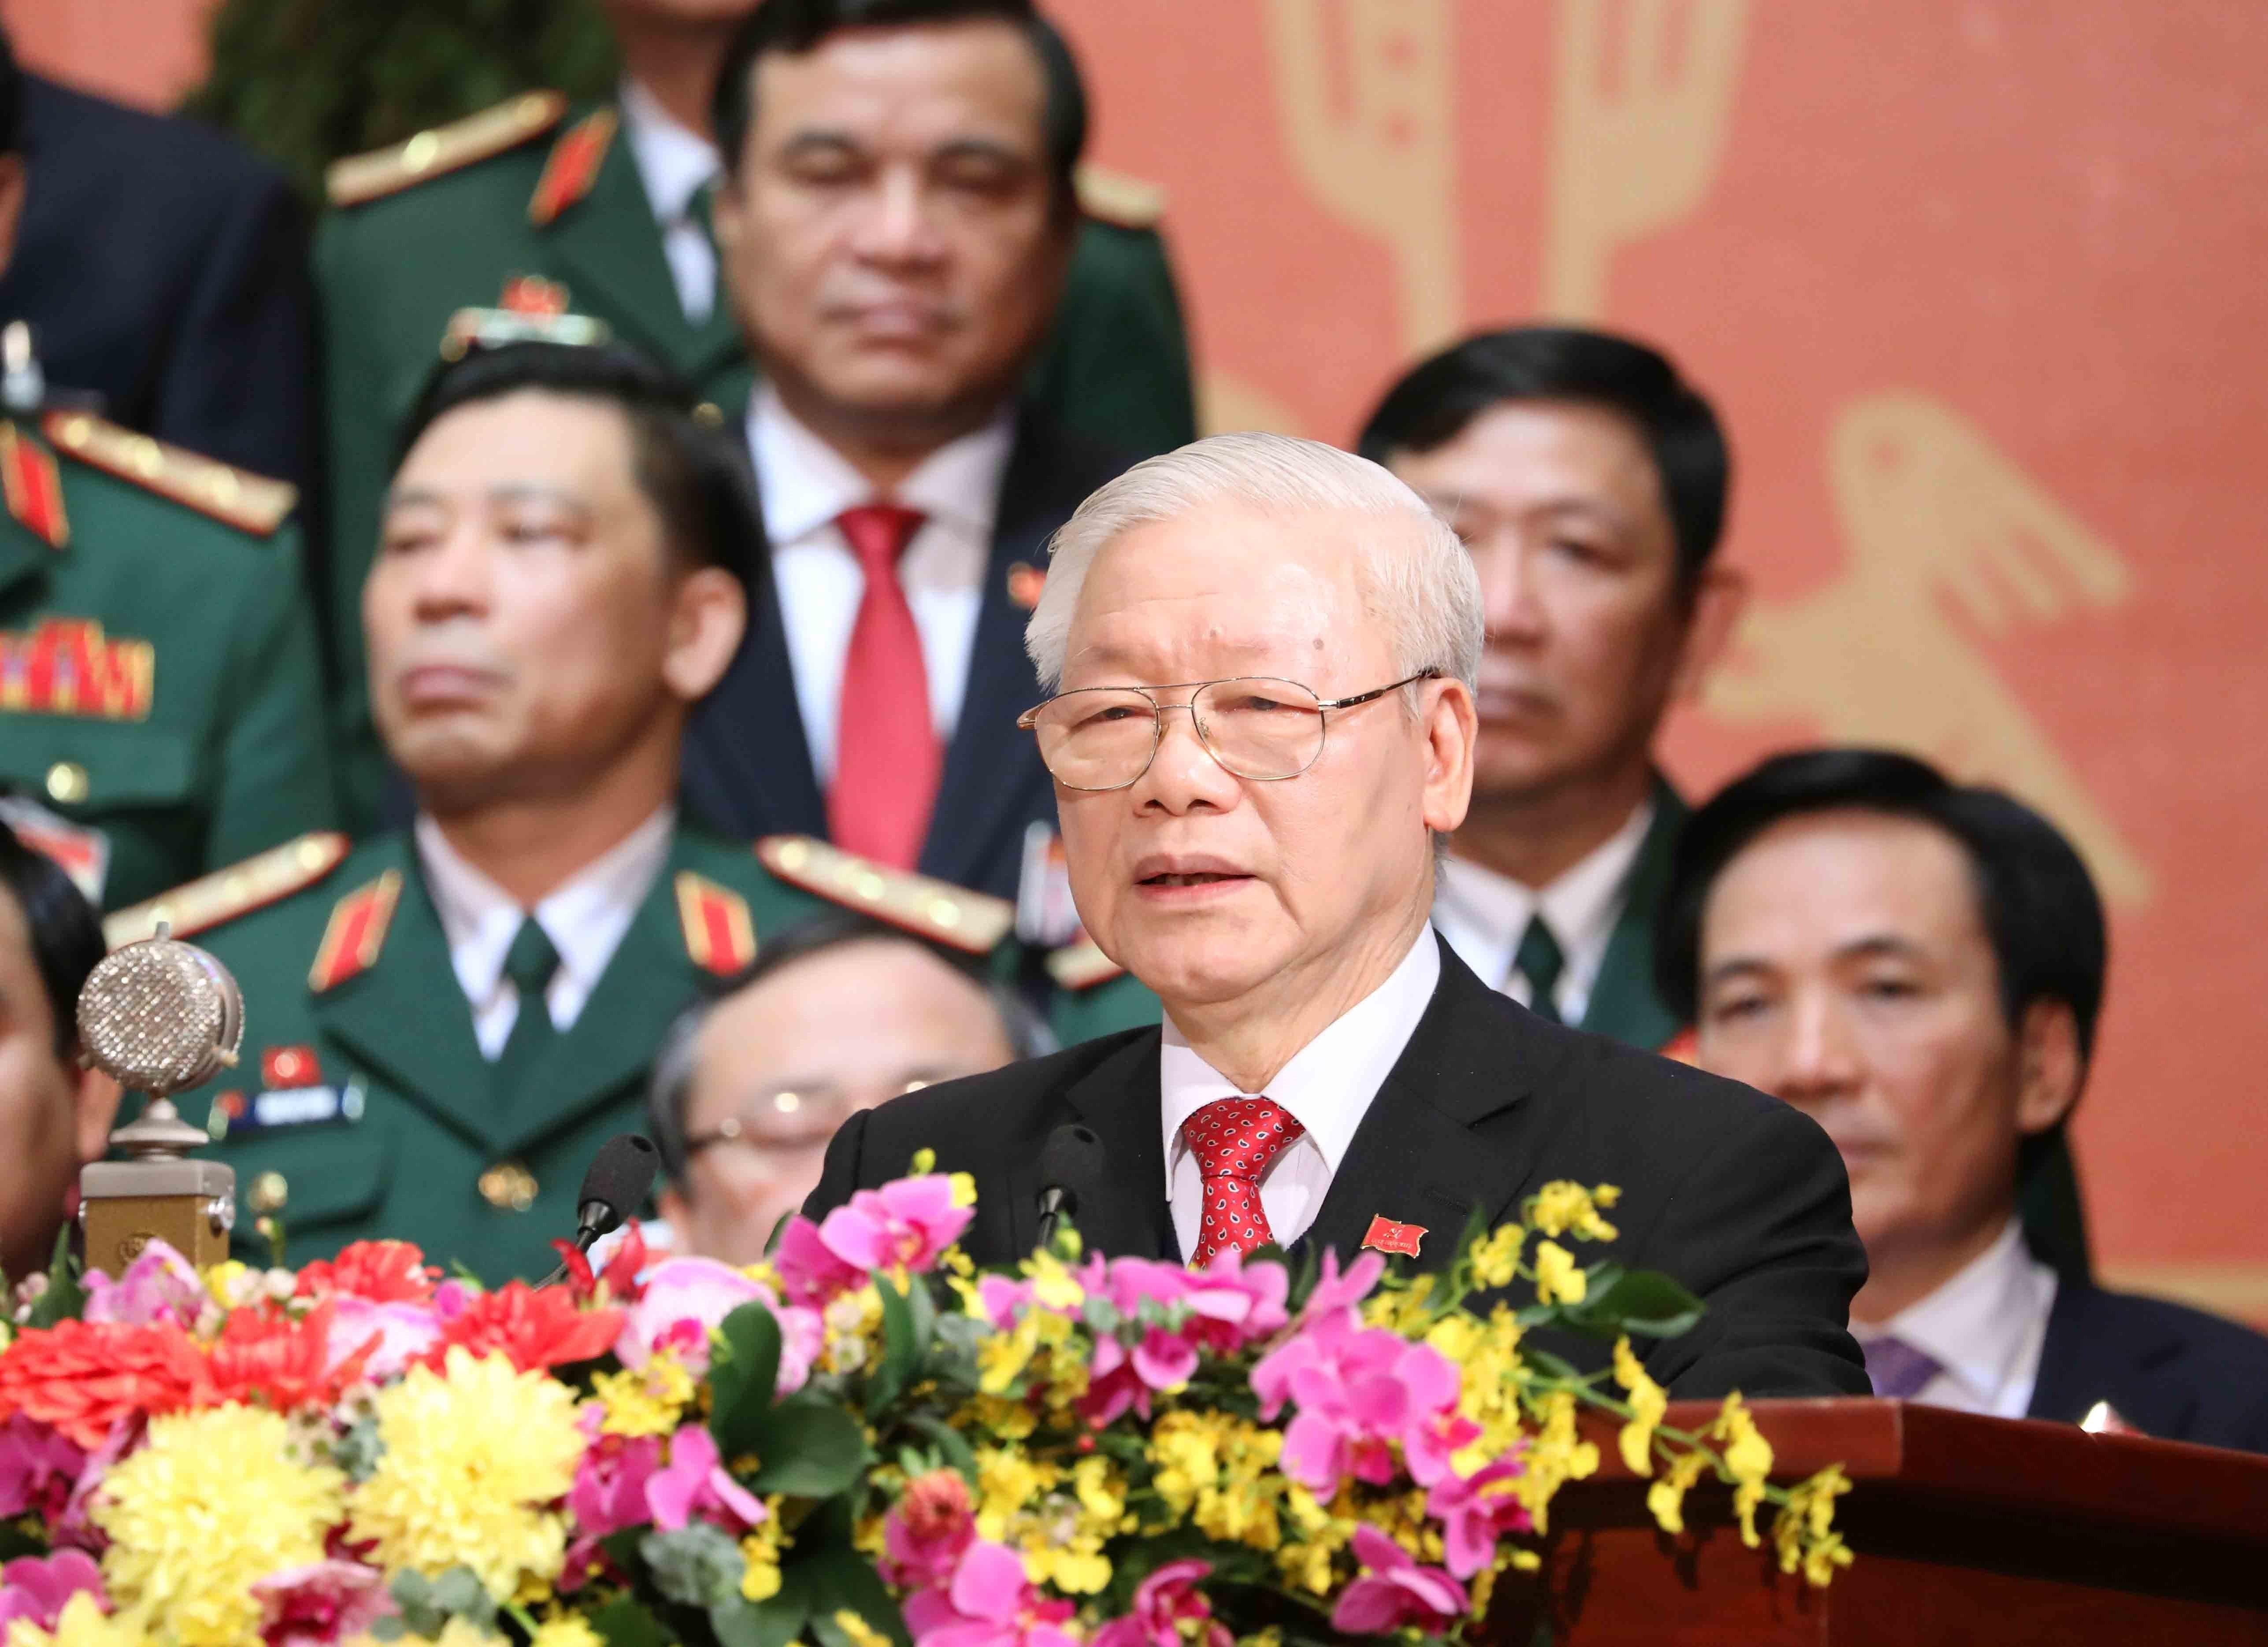 Tong Bi thu: Phat huy suc manh va y chi vuon len cua dan toc hinh anh 2